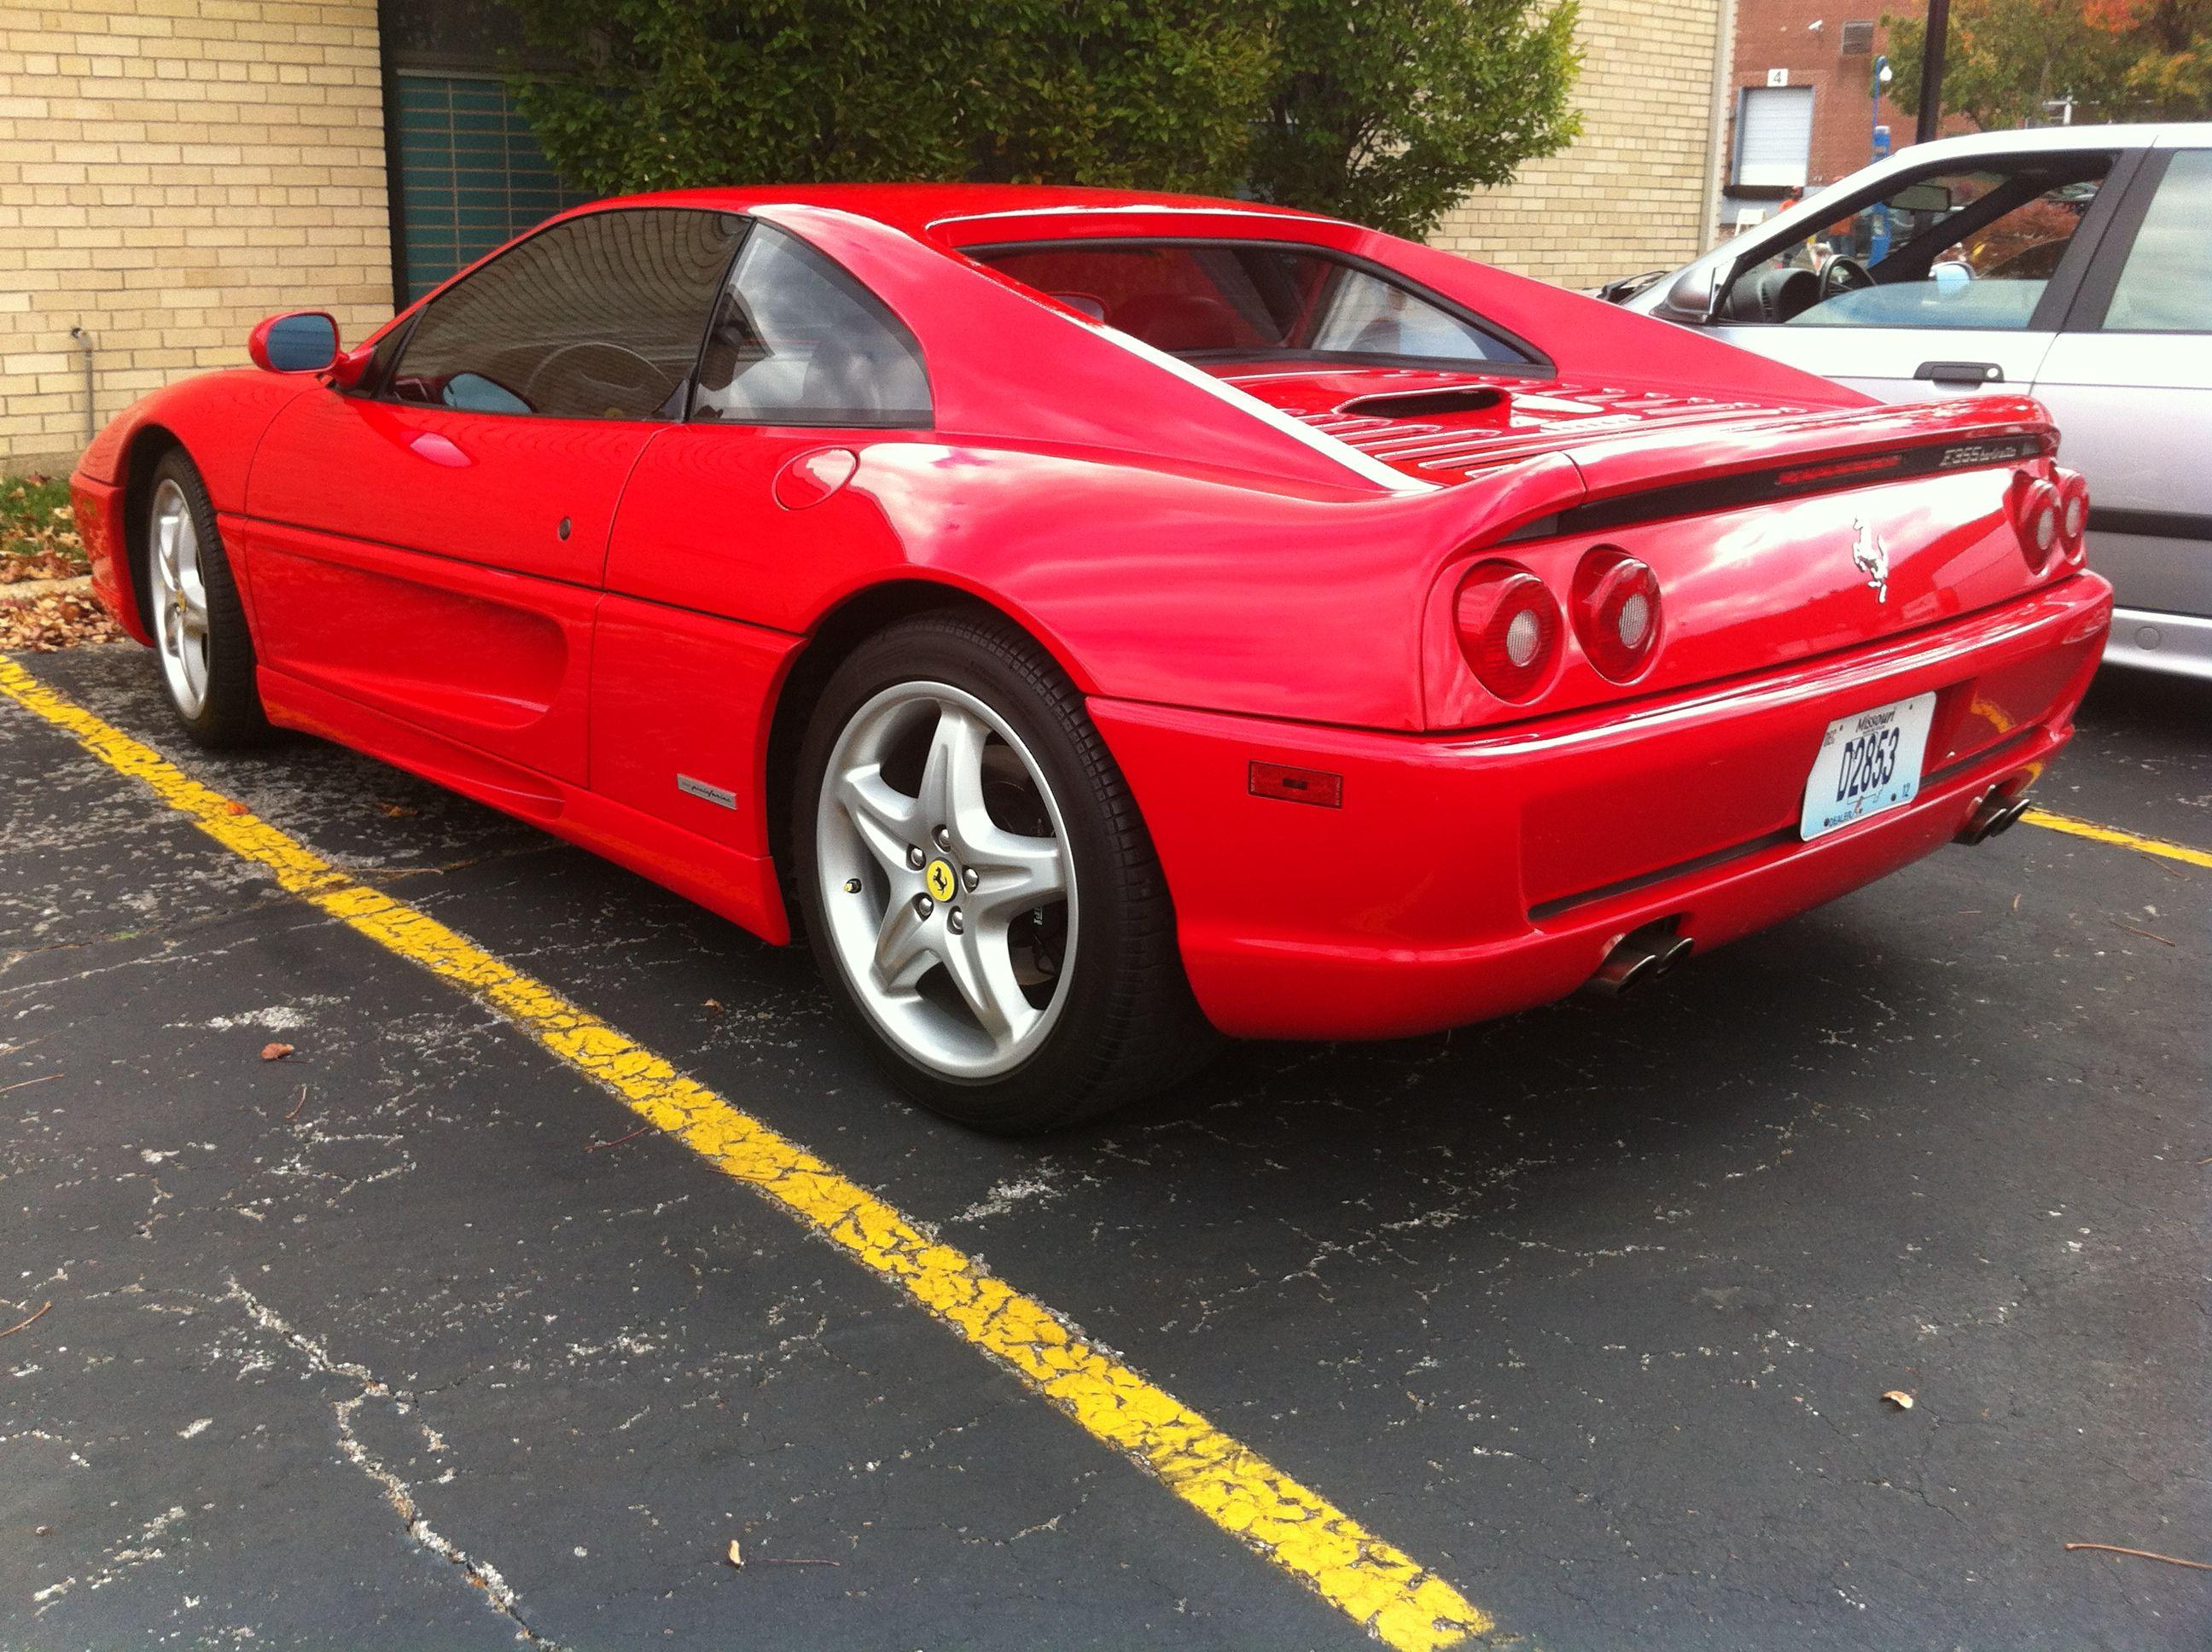 Ferrari Looking Hot Window Tint Job We Did At Autoexotica